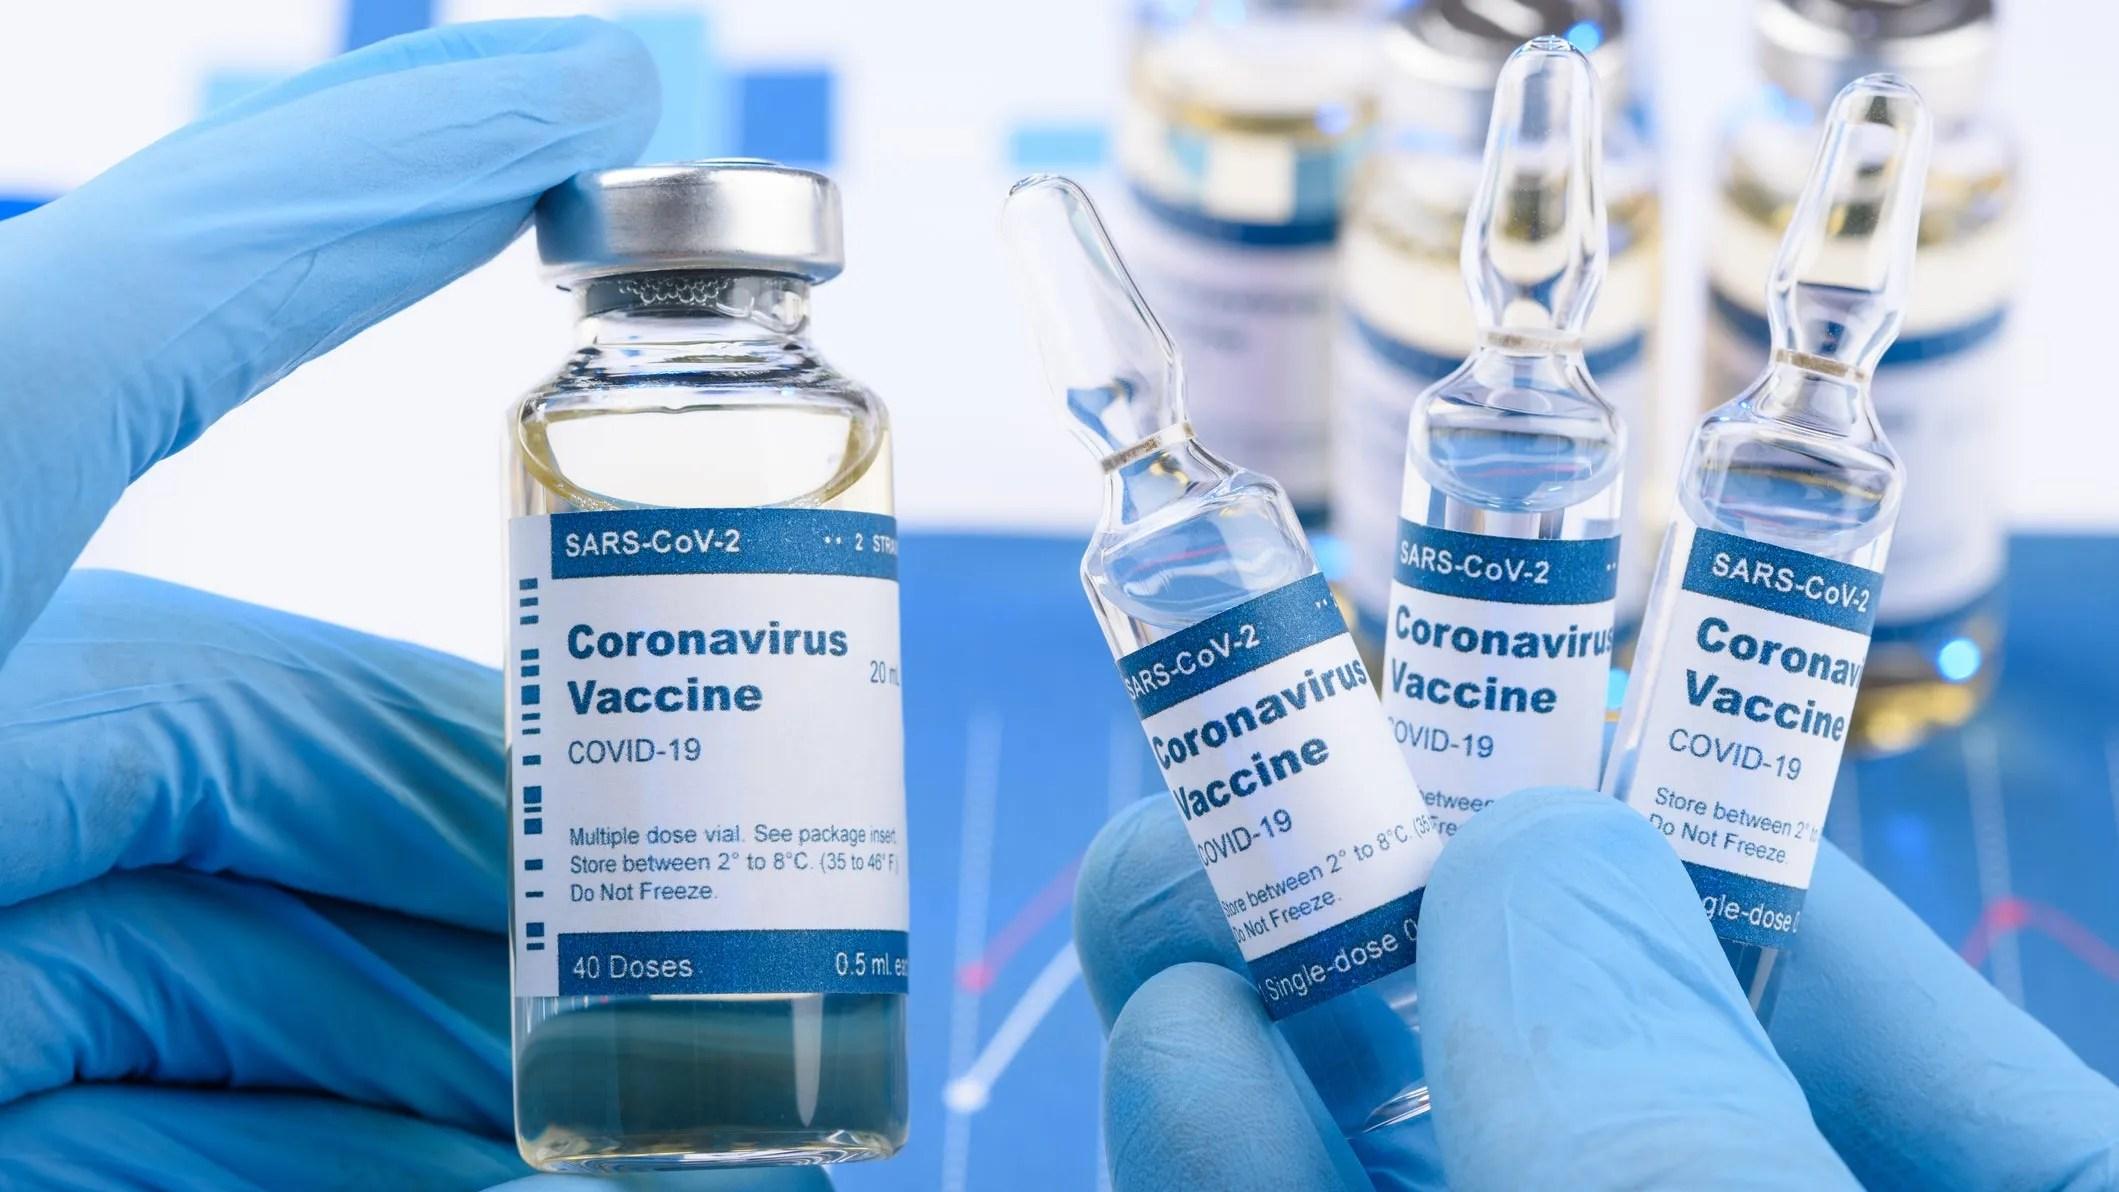 Long rows of COVID-19 vaccine vials